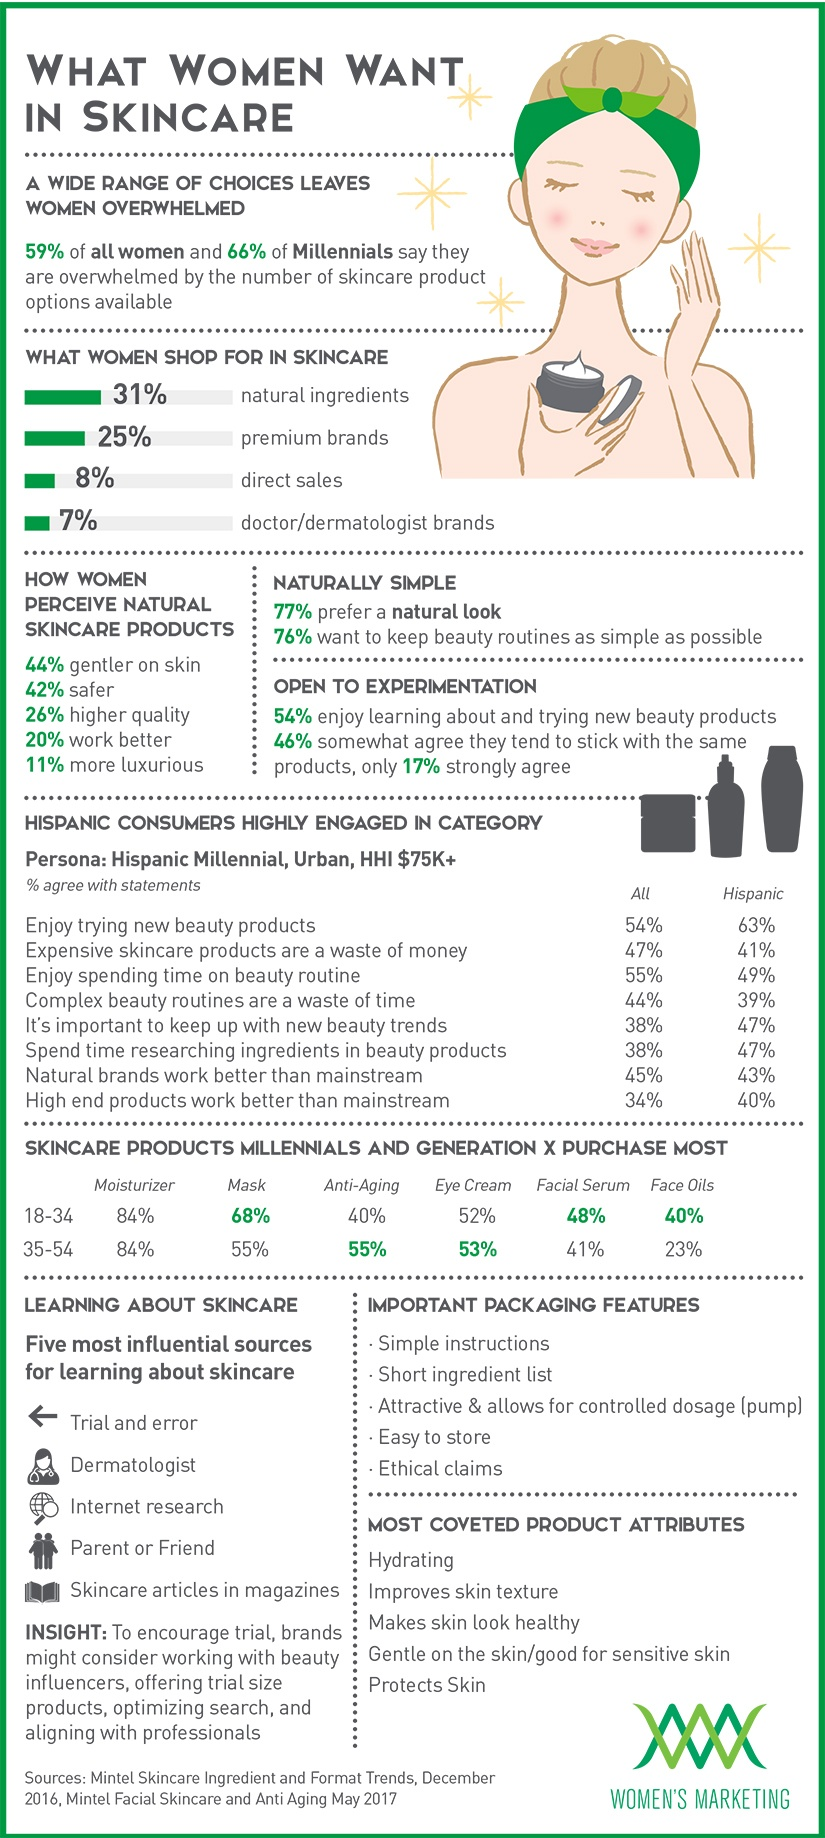 Skincare2017_Infographic.jpg